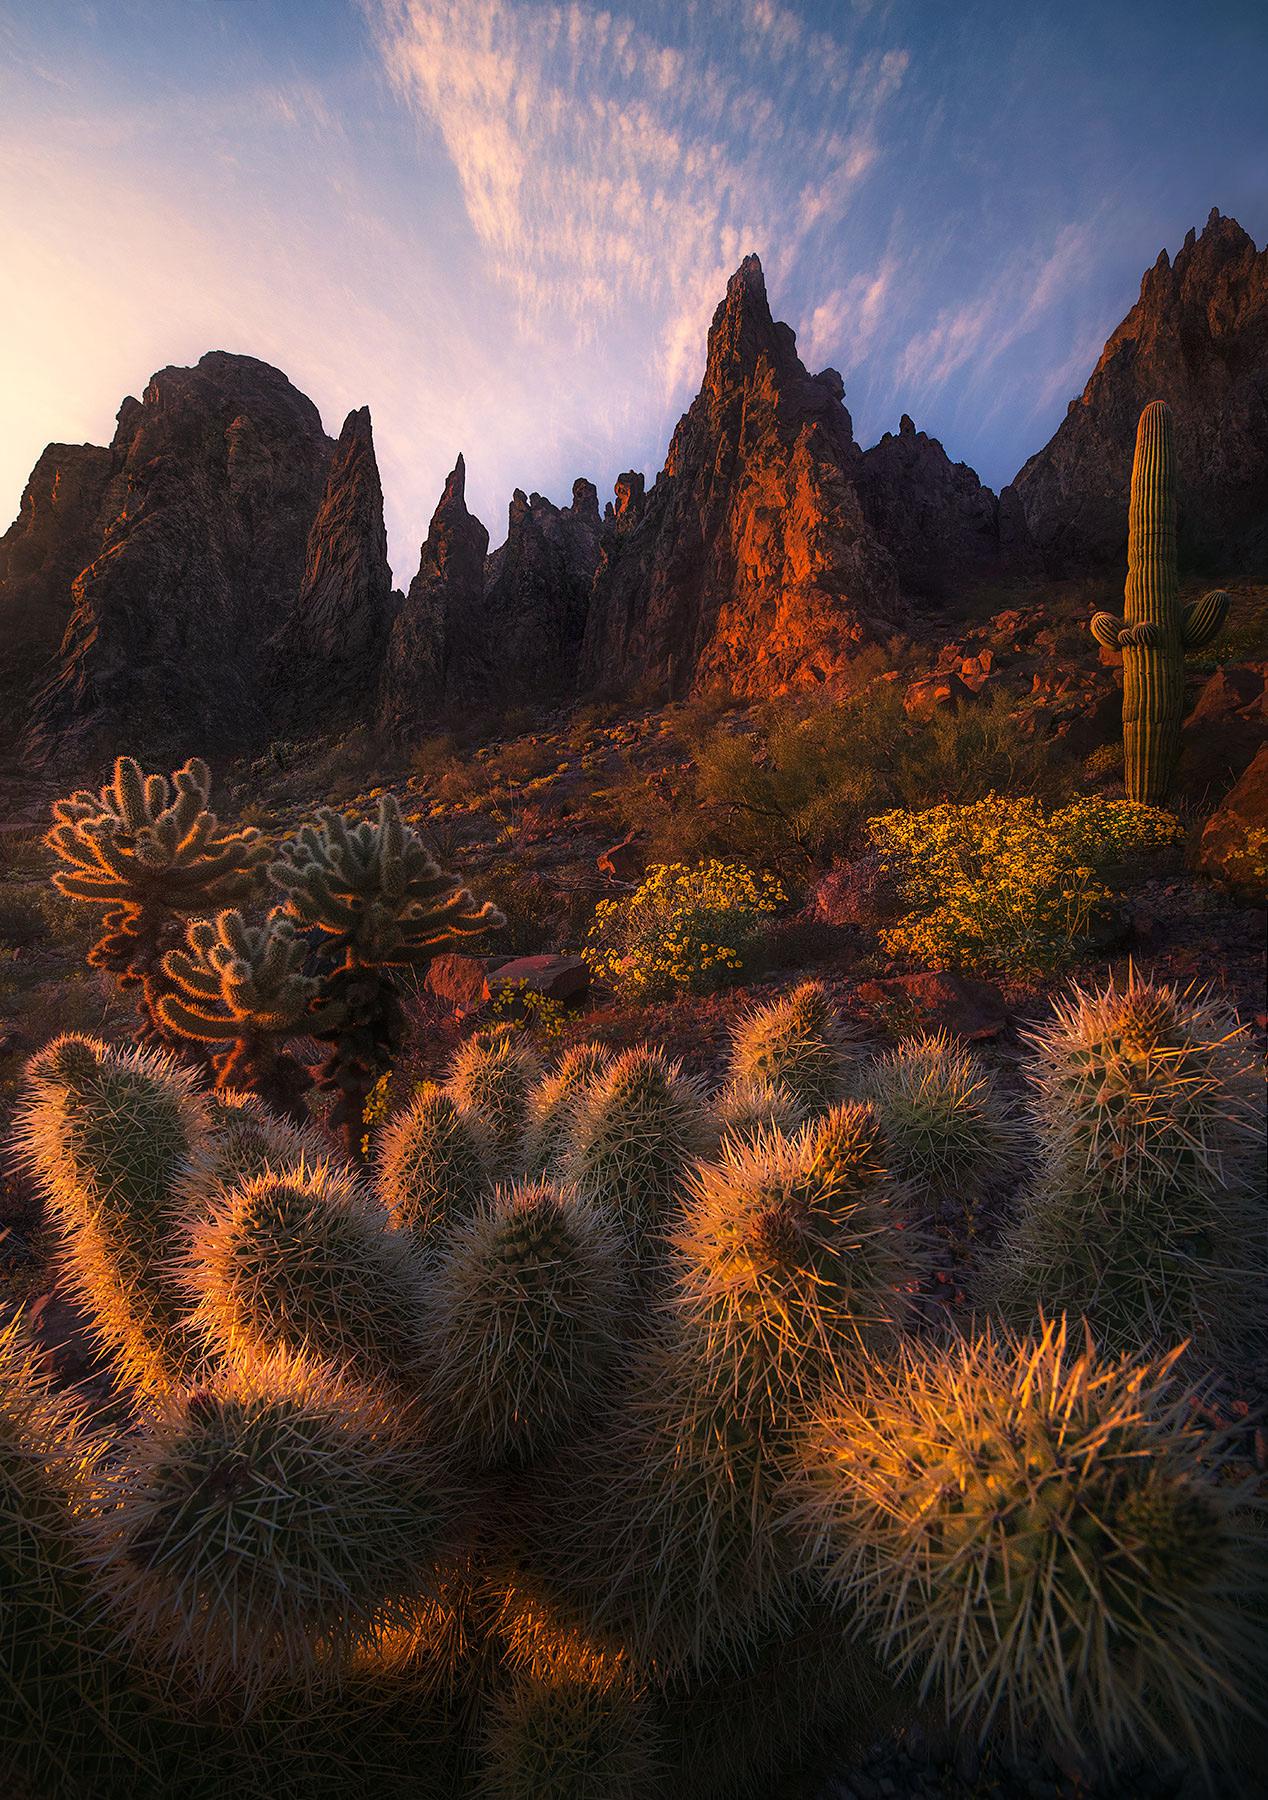 Britlebrush, Arizona, cactus, spire, mountains, photo